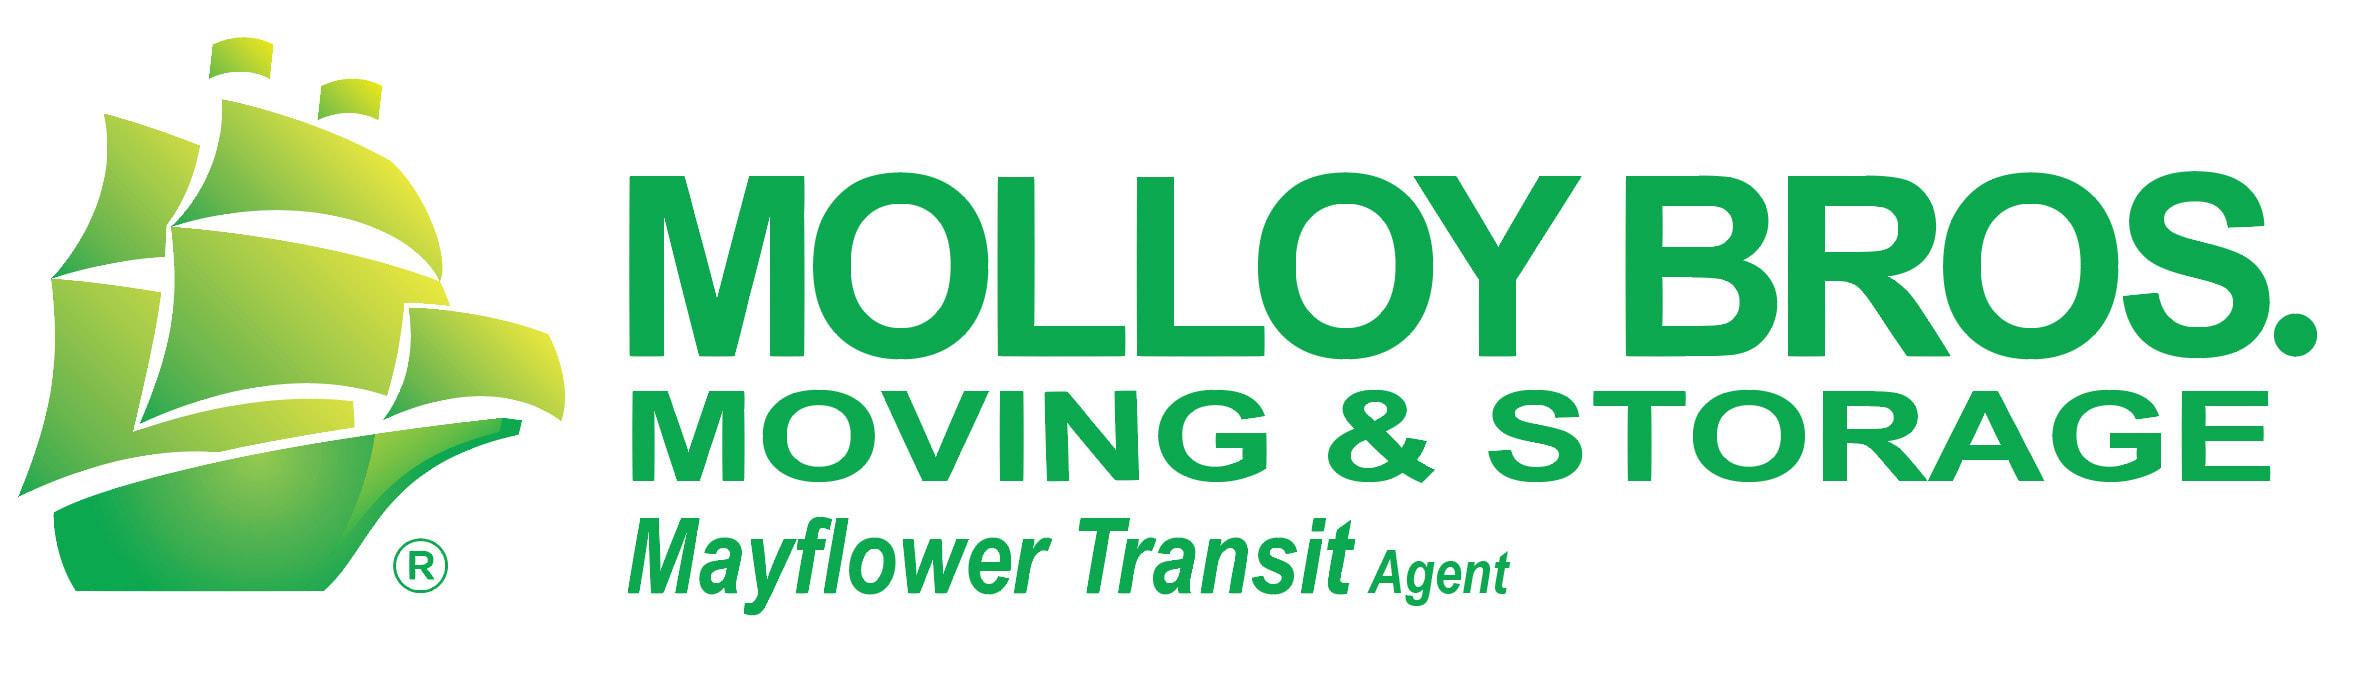 Molloy Bros. Moving & Storage Logo